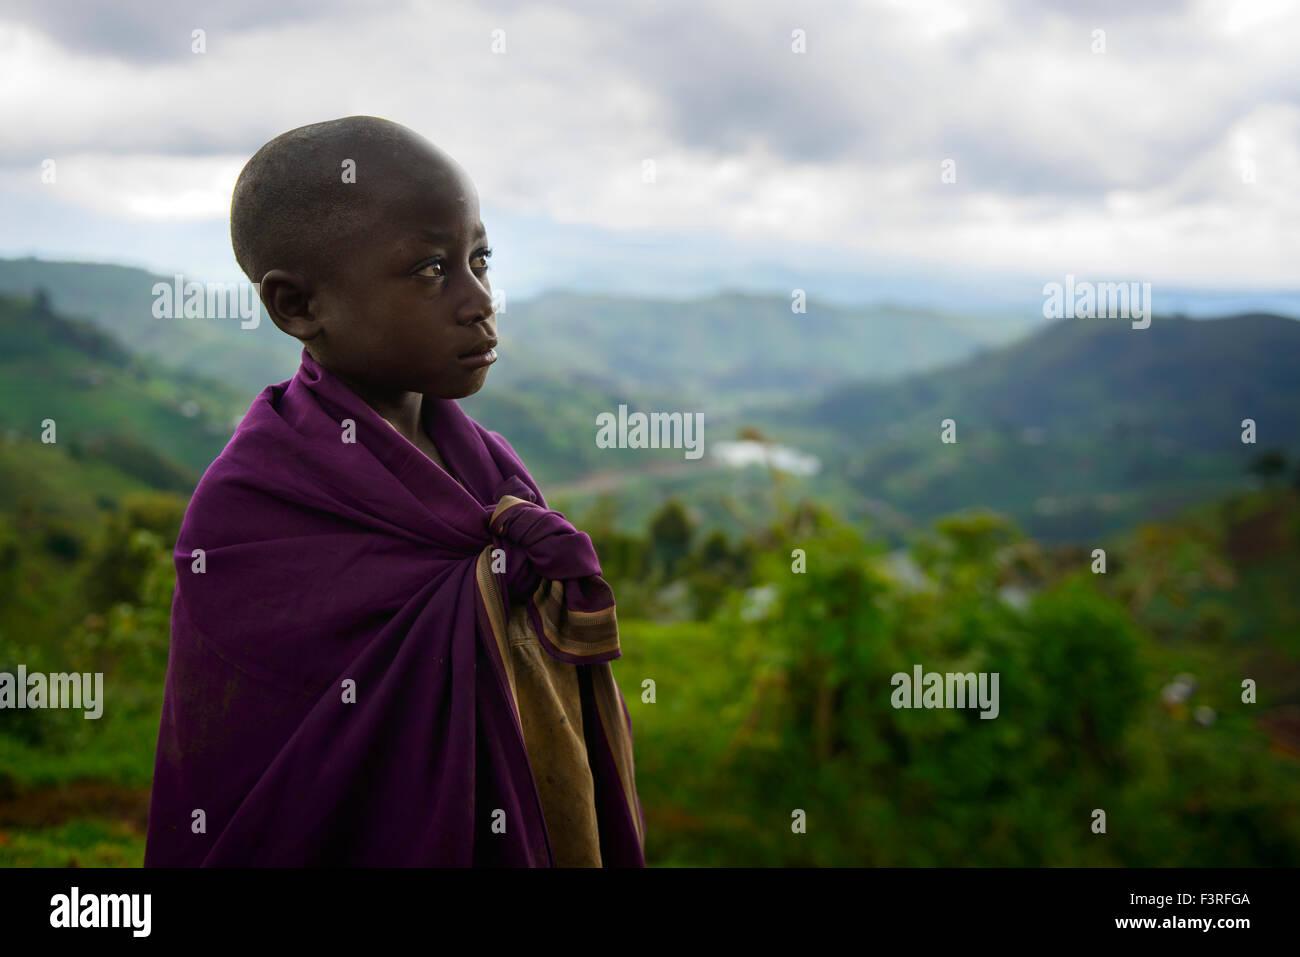 Boy in the Virunga region, Uganda, Africa - Stock Image